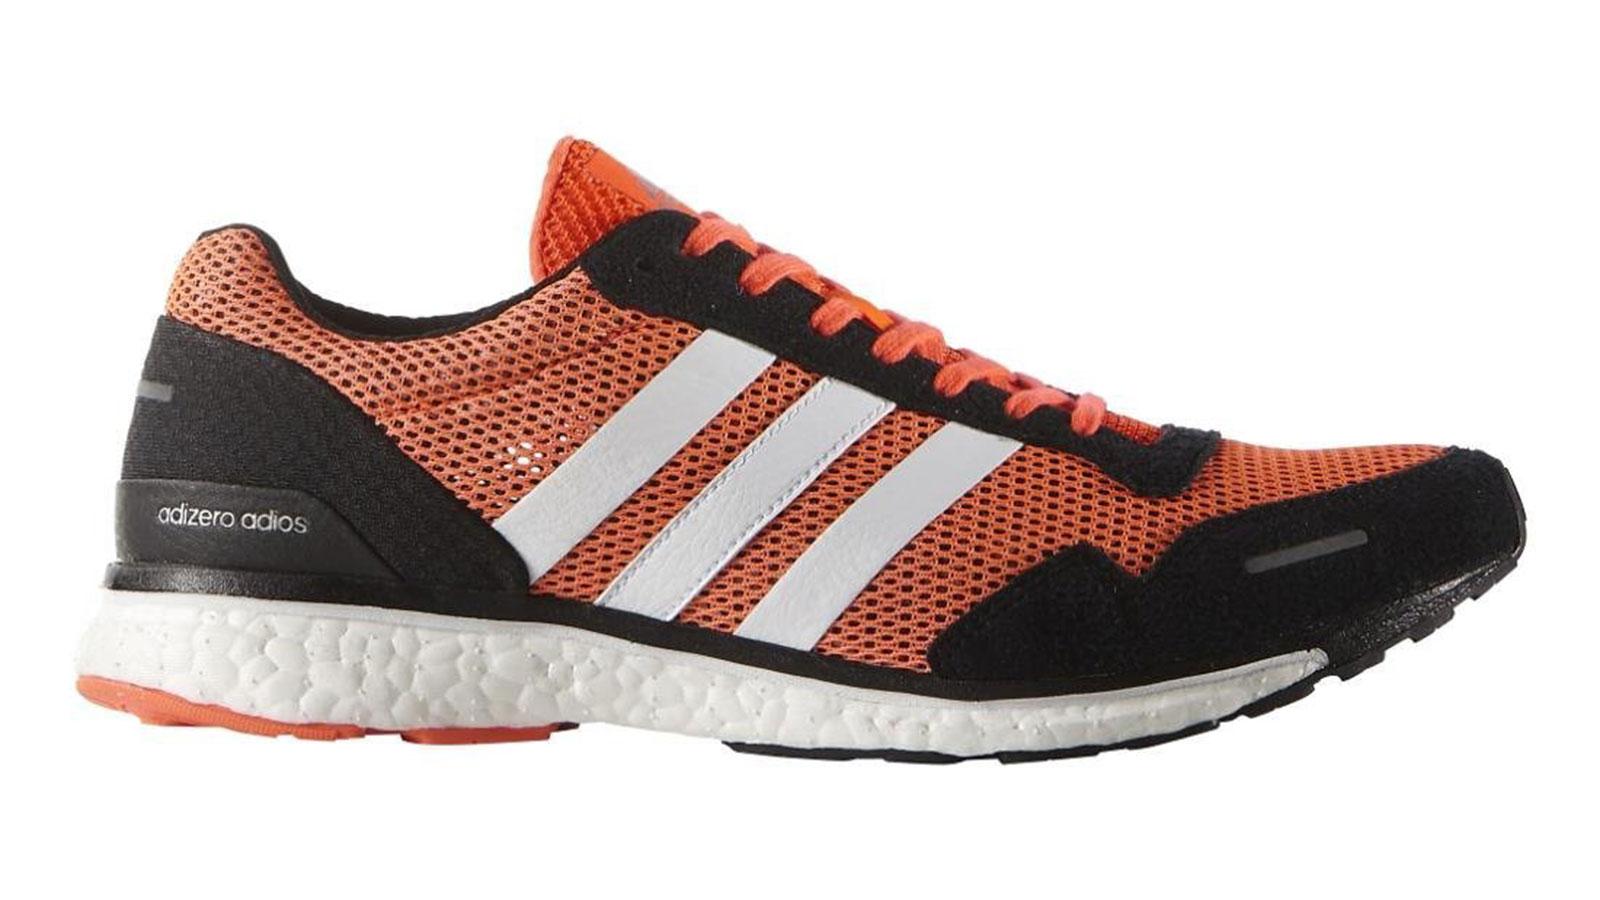 Adidas Adizero Adios 3 Men's Running Shoe | best running shoes for men